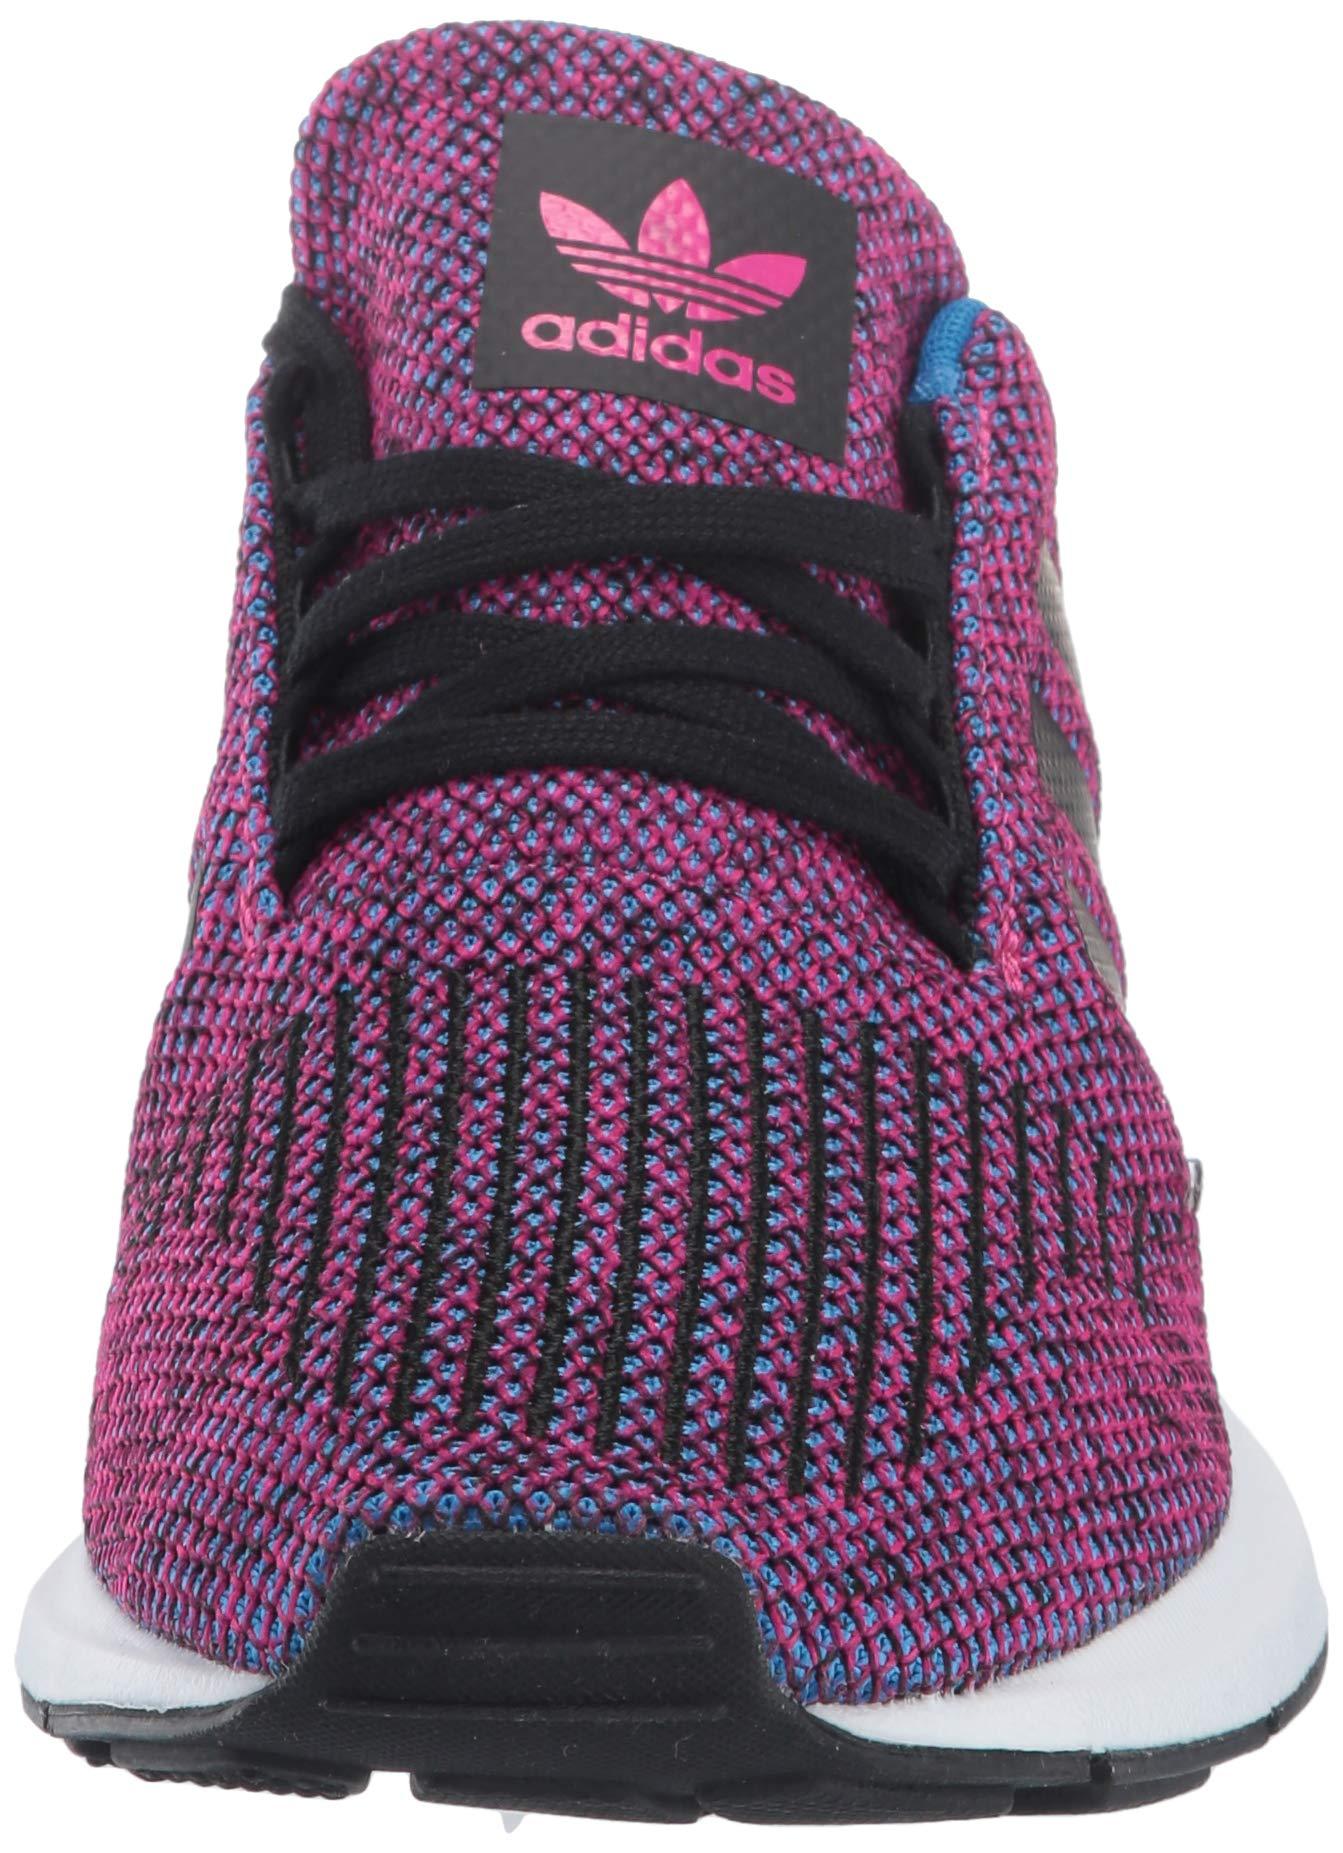 adidas Originals Baby Swift Running Shoe Real Magenta Black, 10K M US Toddler by adidas Originals (Image #4)